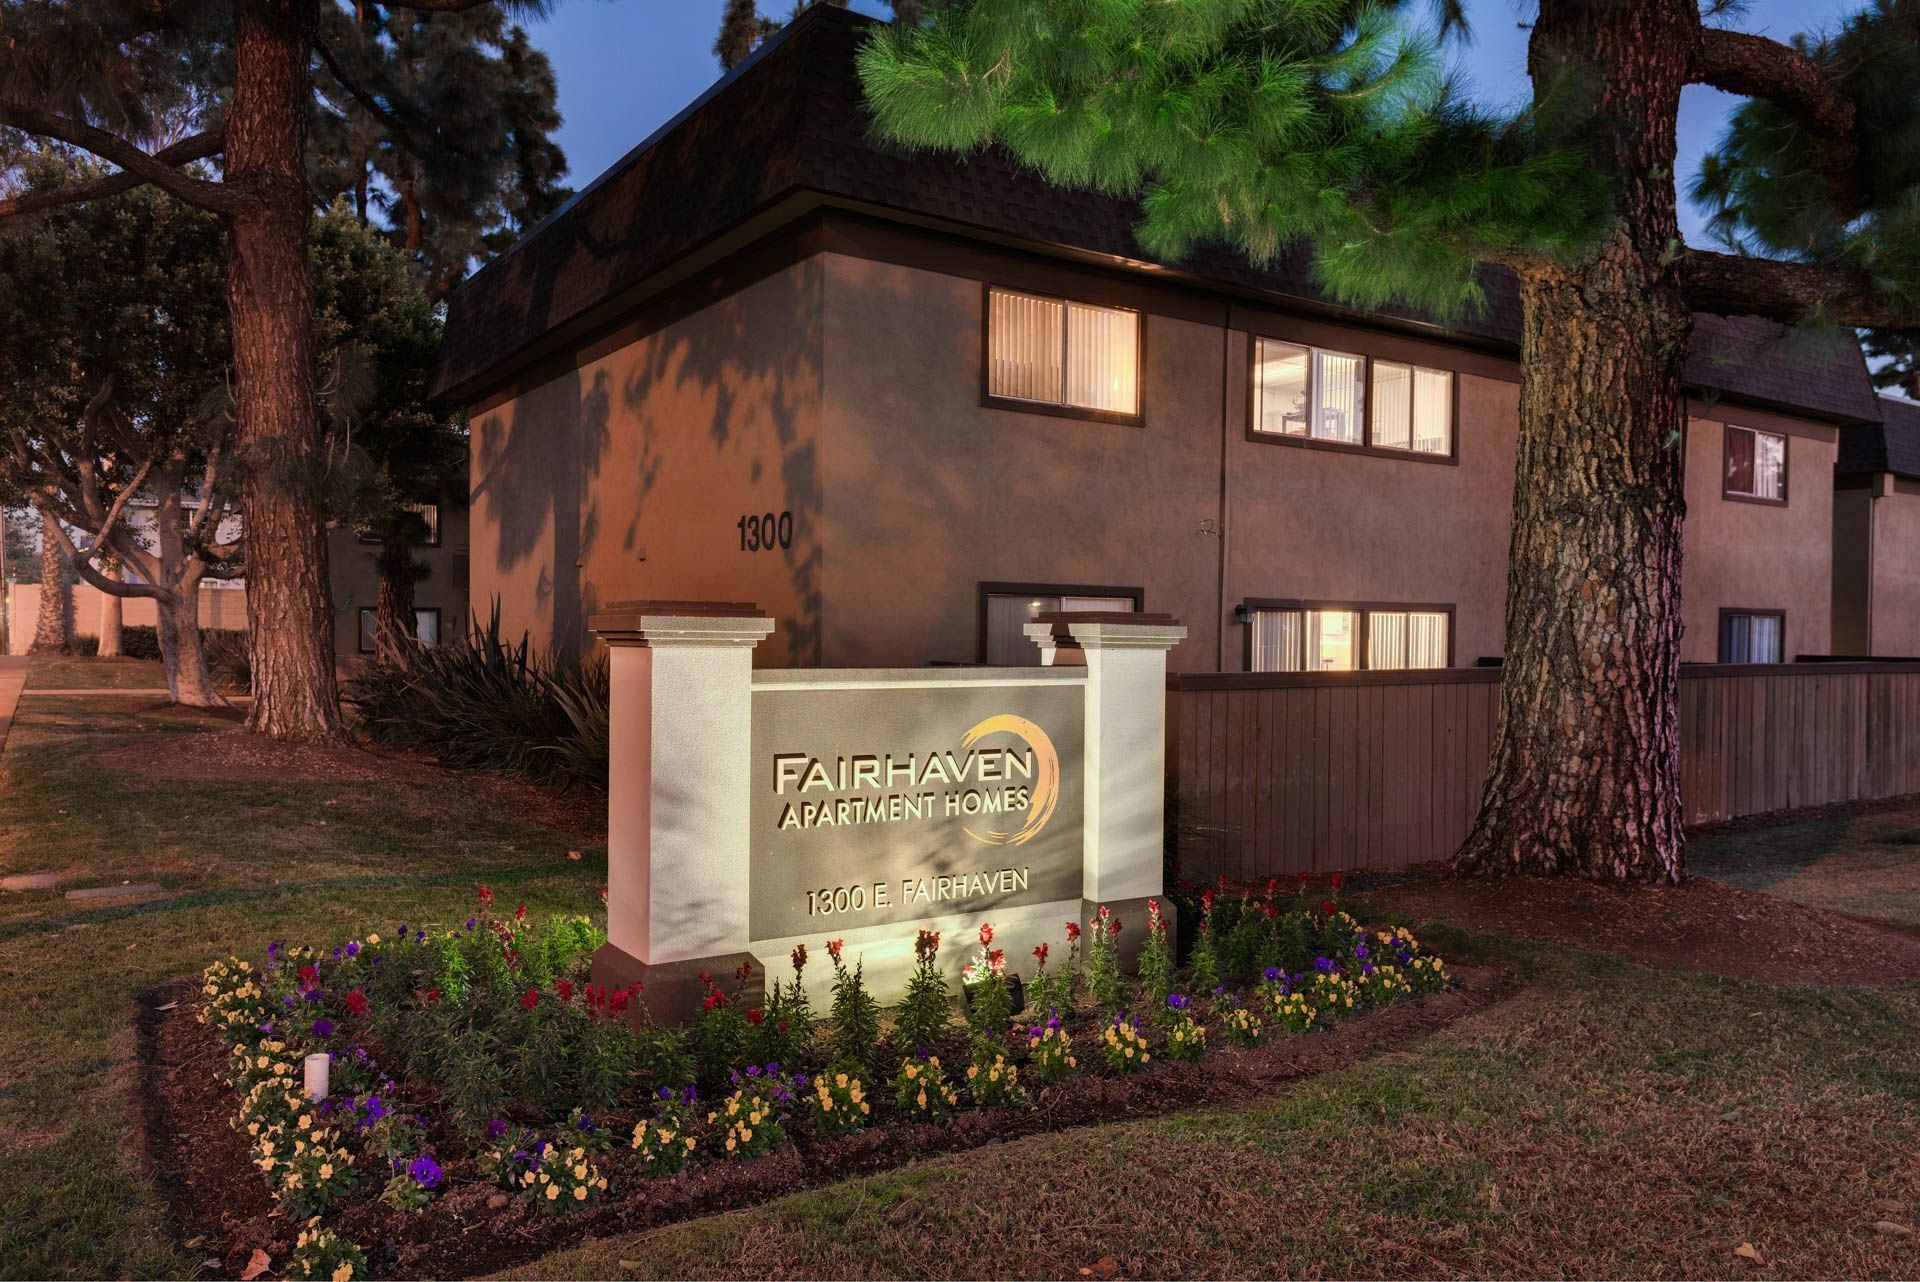 Fairhaven Apartment Homes